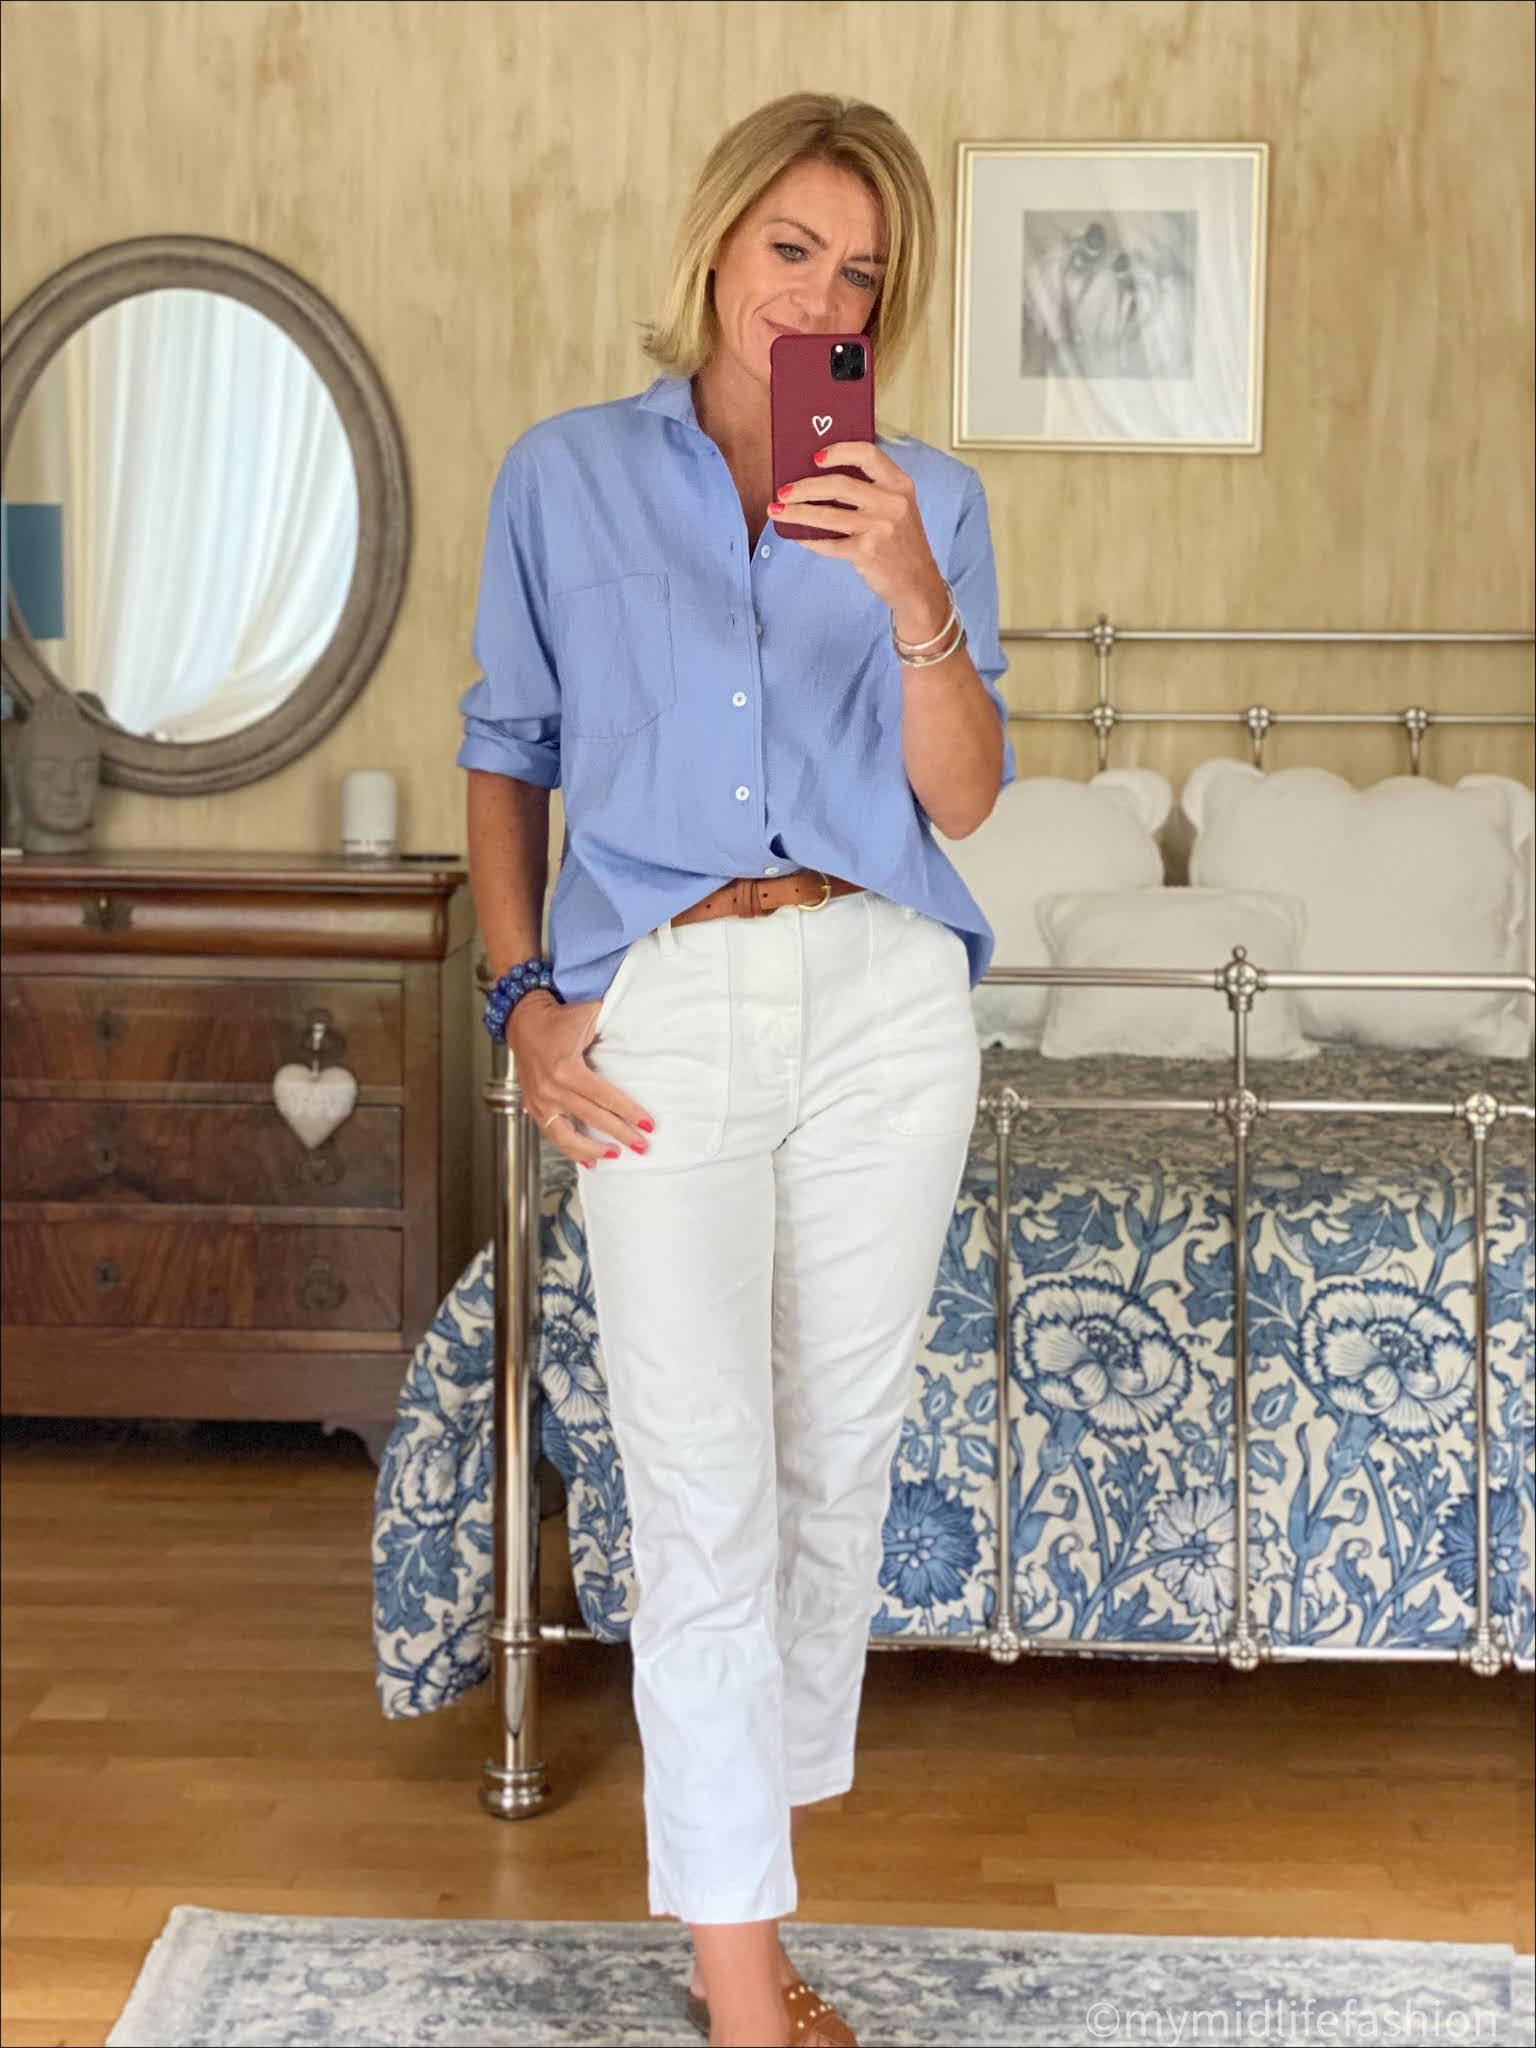 my midlife fashion, Zara chambray oversized shirt, Massimo Dutti leather belt, j crew cropped kick flare jeans, basalt studded leather sliders